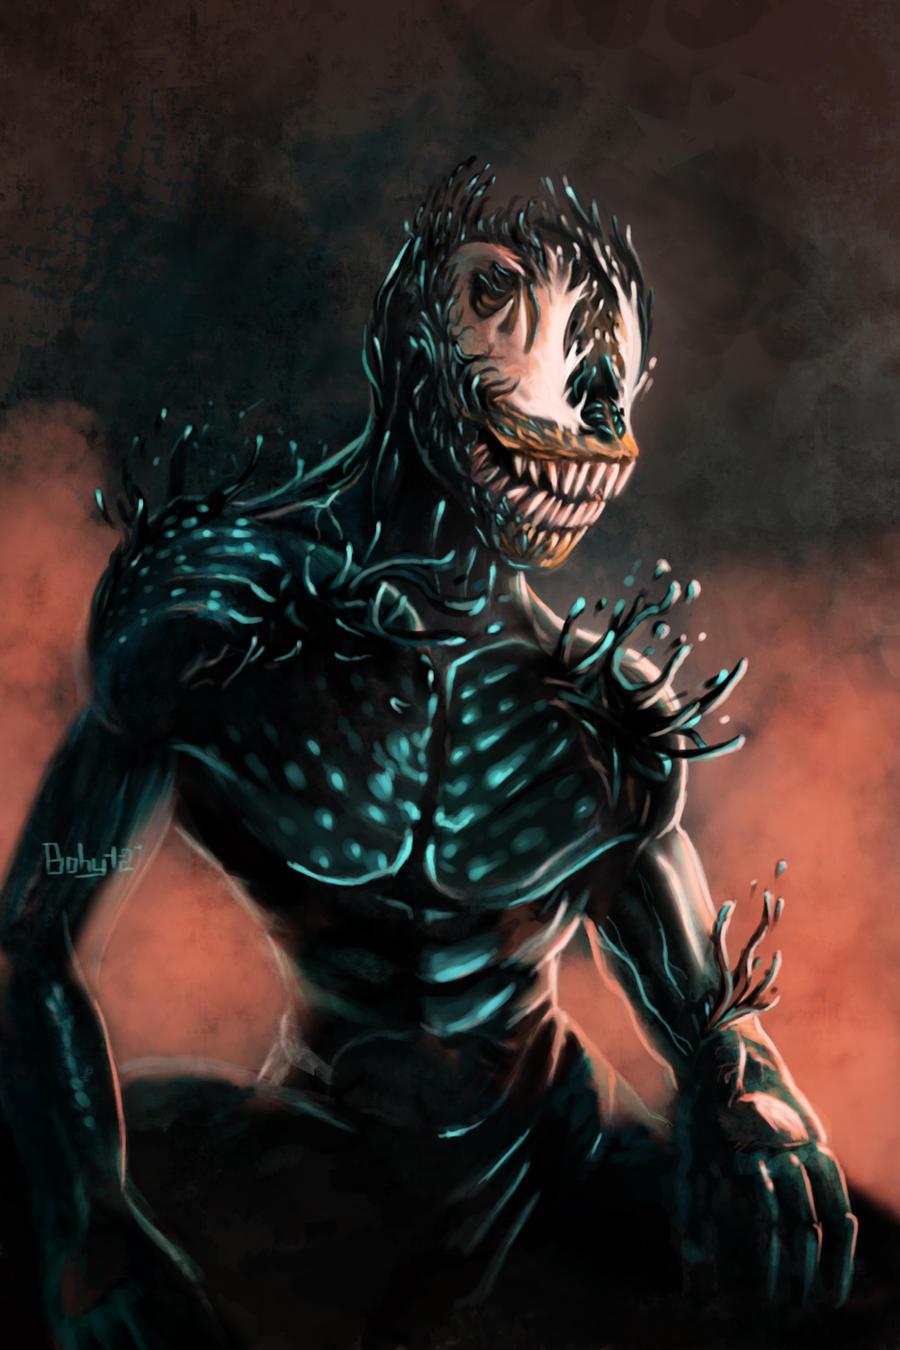 Venom - Symbiont by Bohy